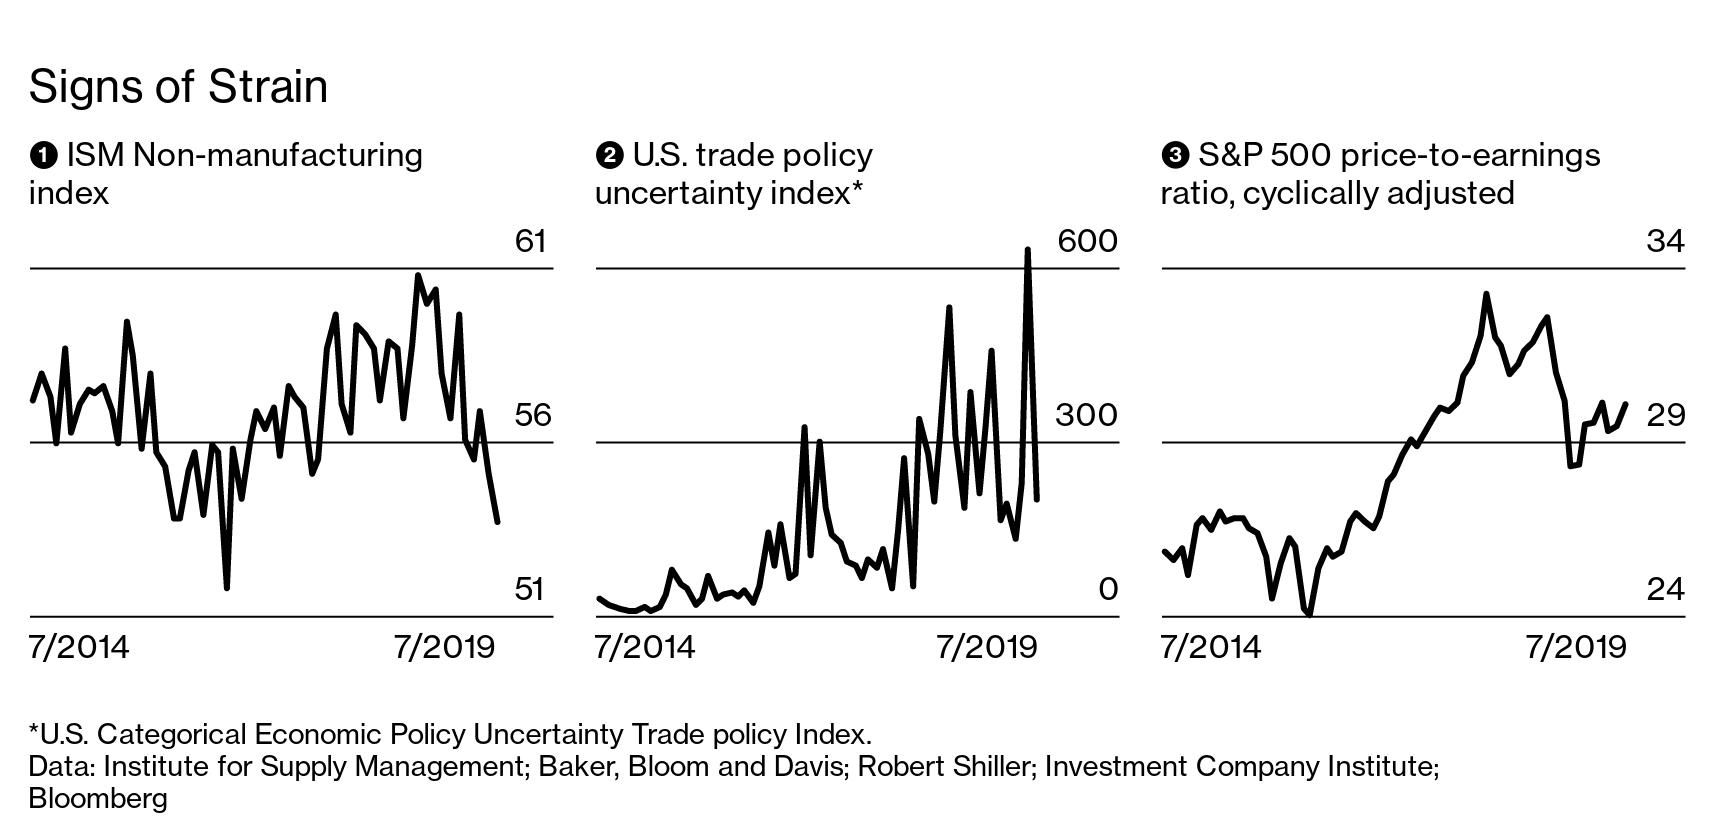 Powell Speaks, Trump Tweets, China Reacts, Markets Freak, Repeat